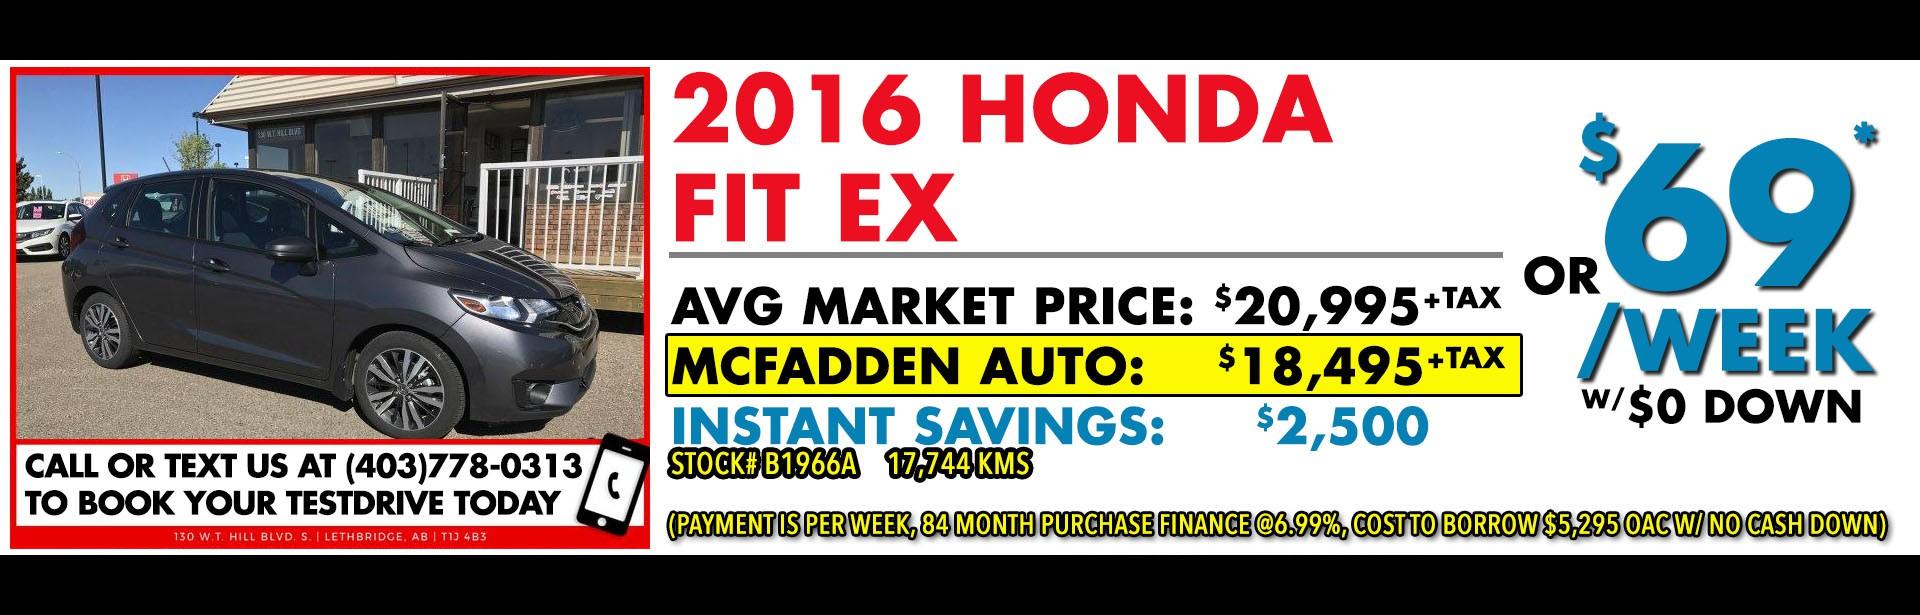 McFadden Auto - B1966A - 2016 Honda Fit EX - Nov 2017 - 1